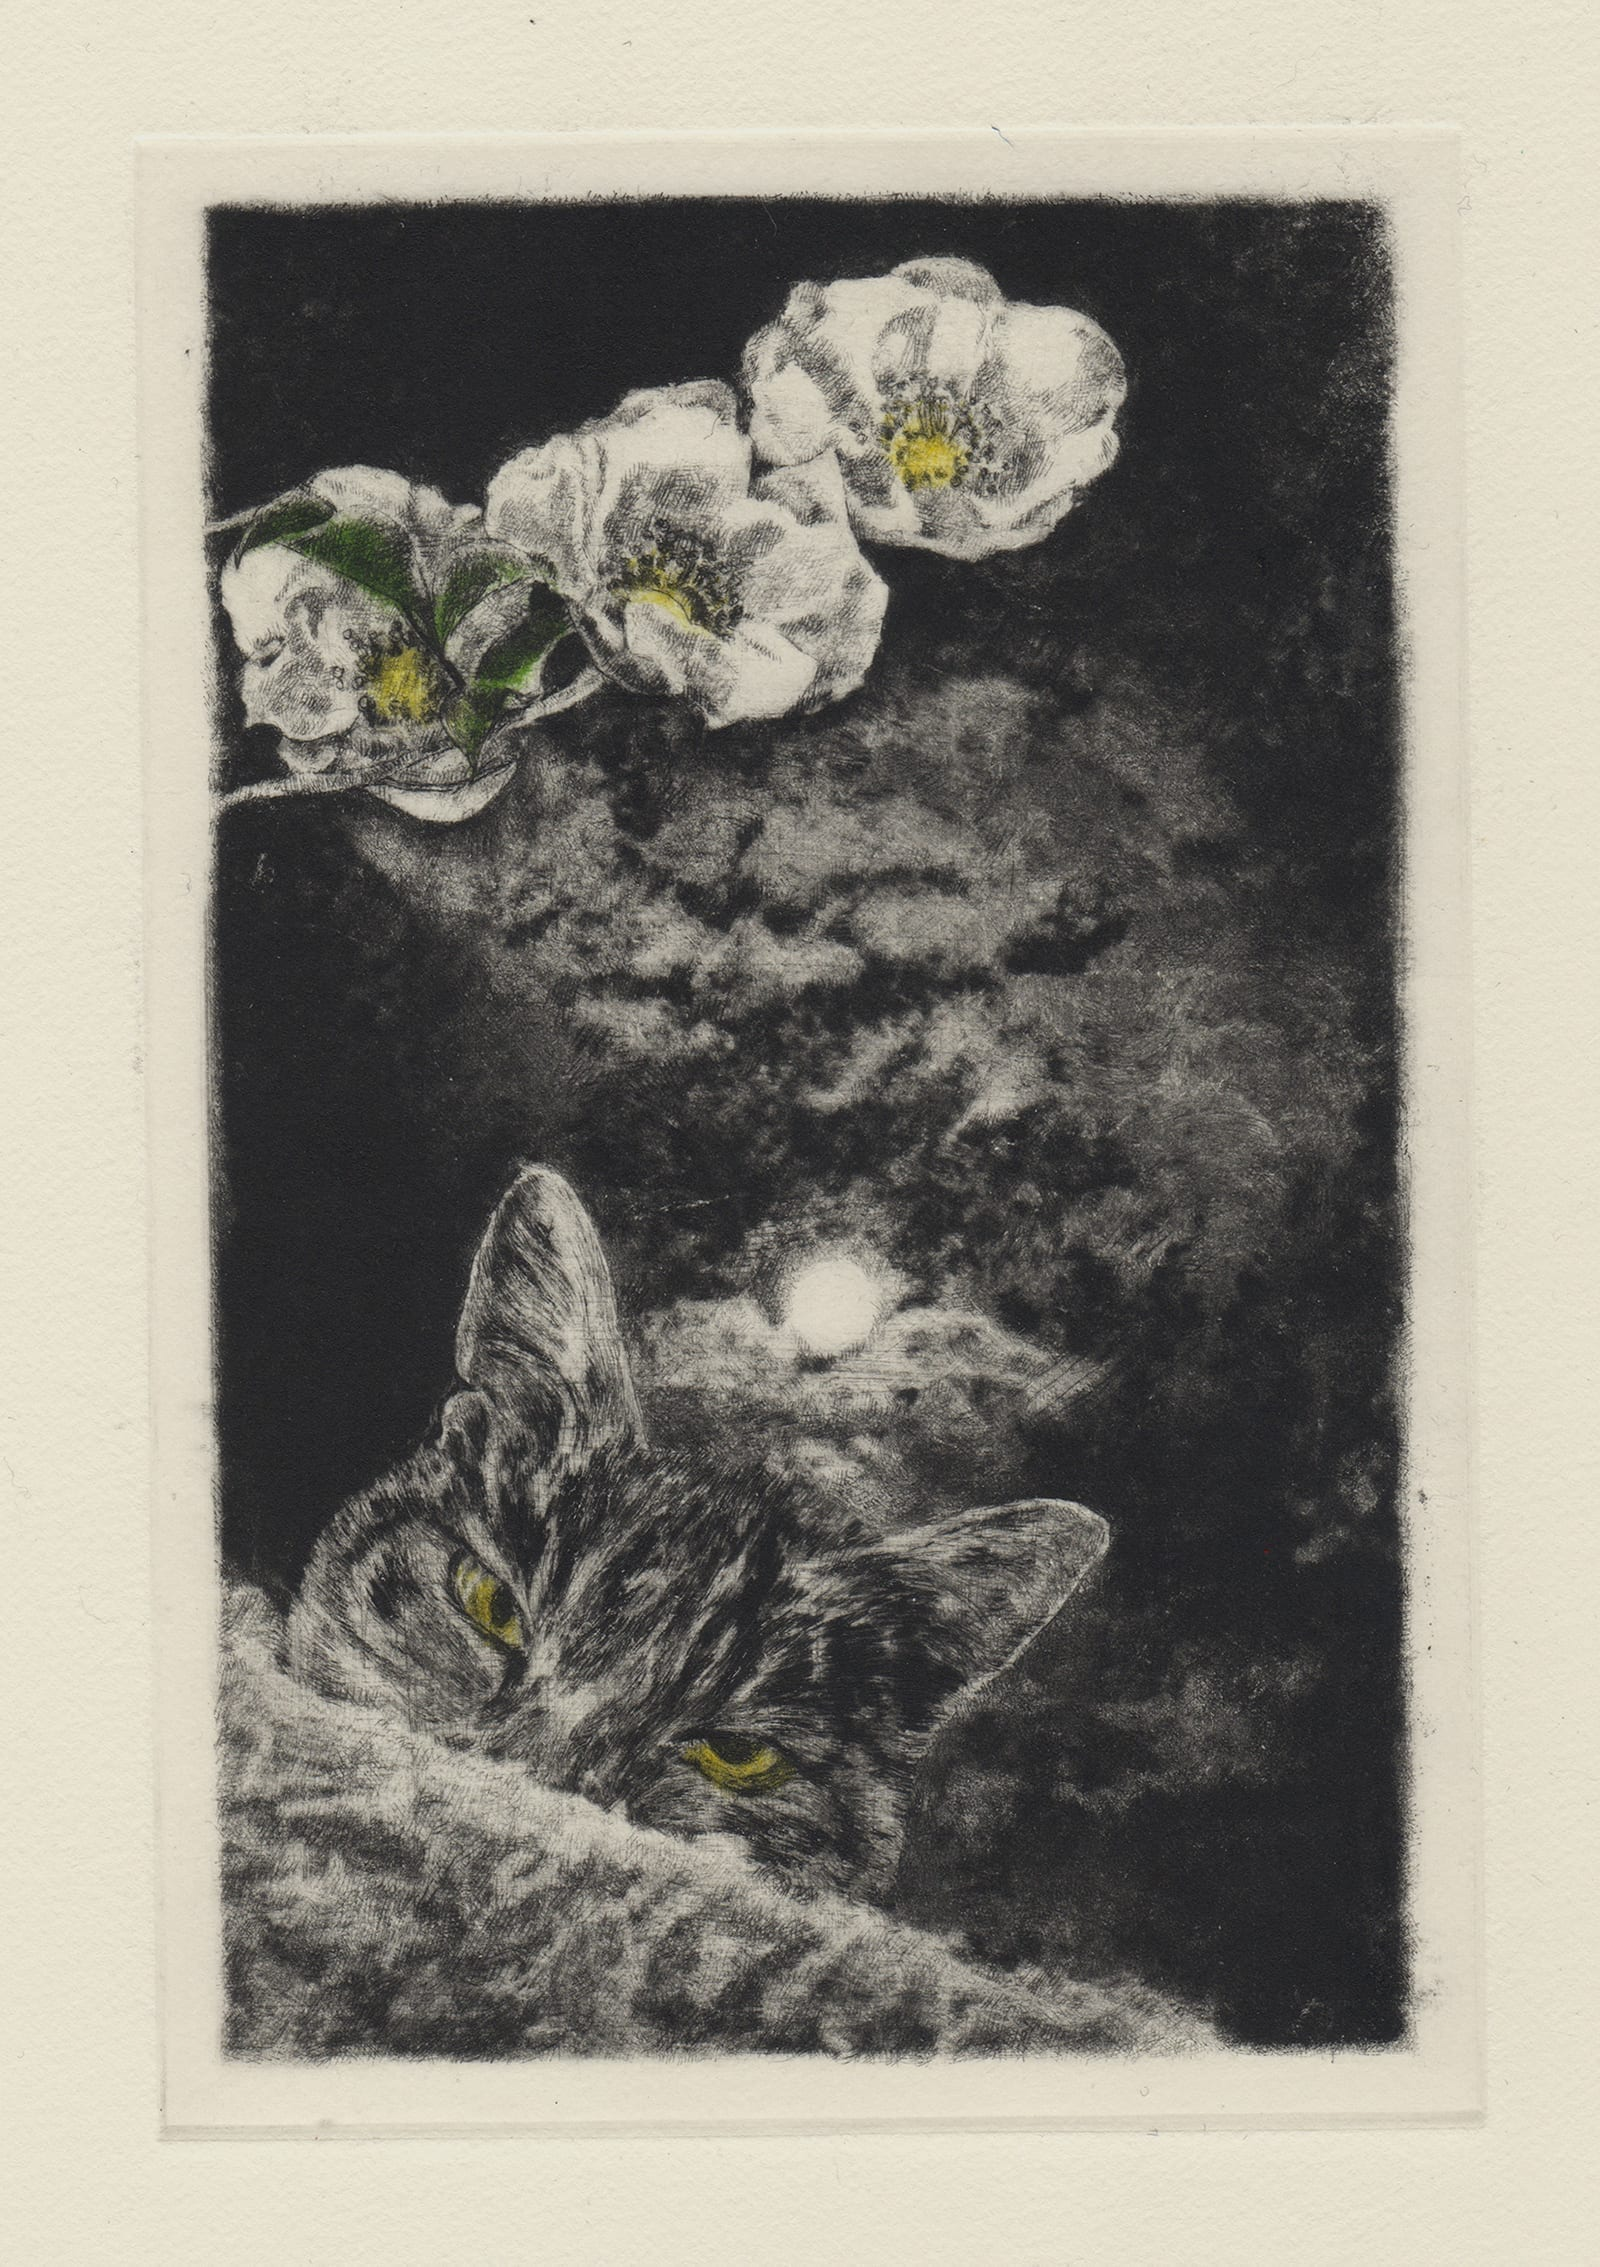 Kyoku and thirteenth night moon (drypoint etching by Yaemi Shigyo)